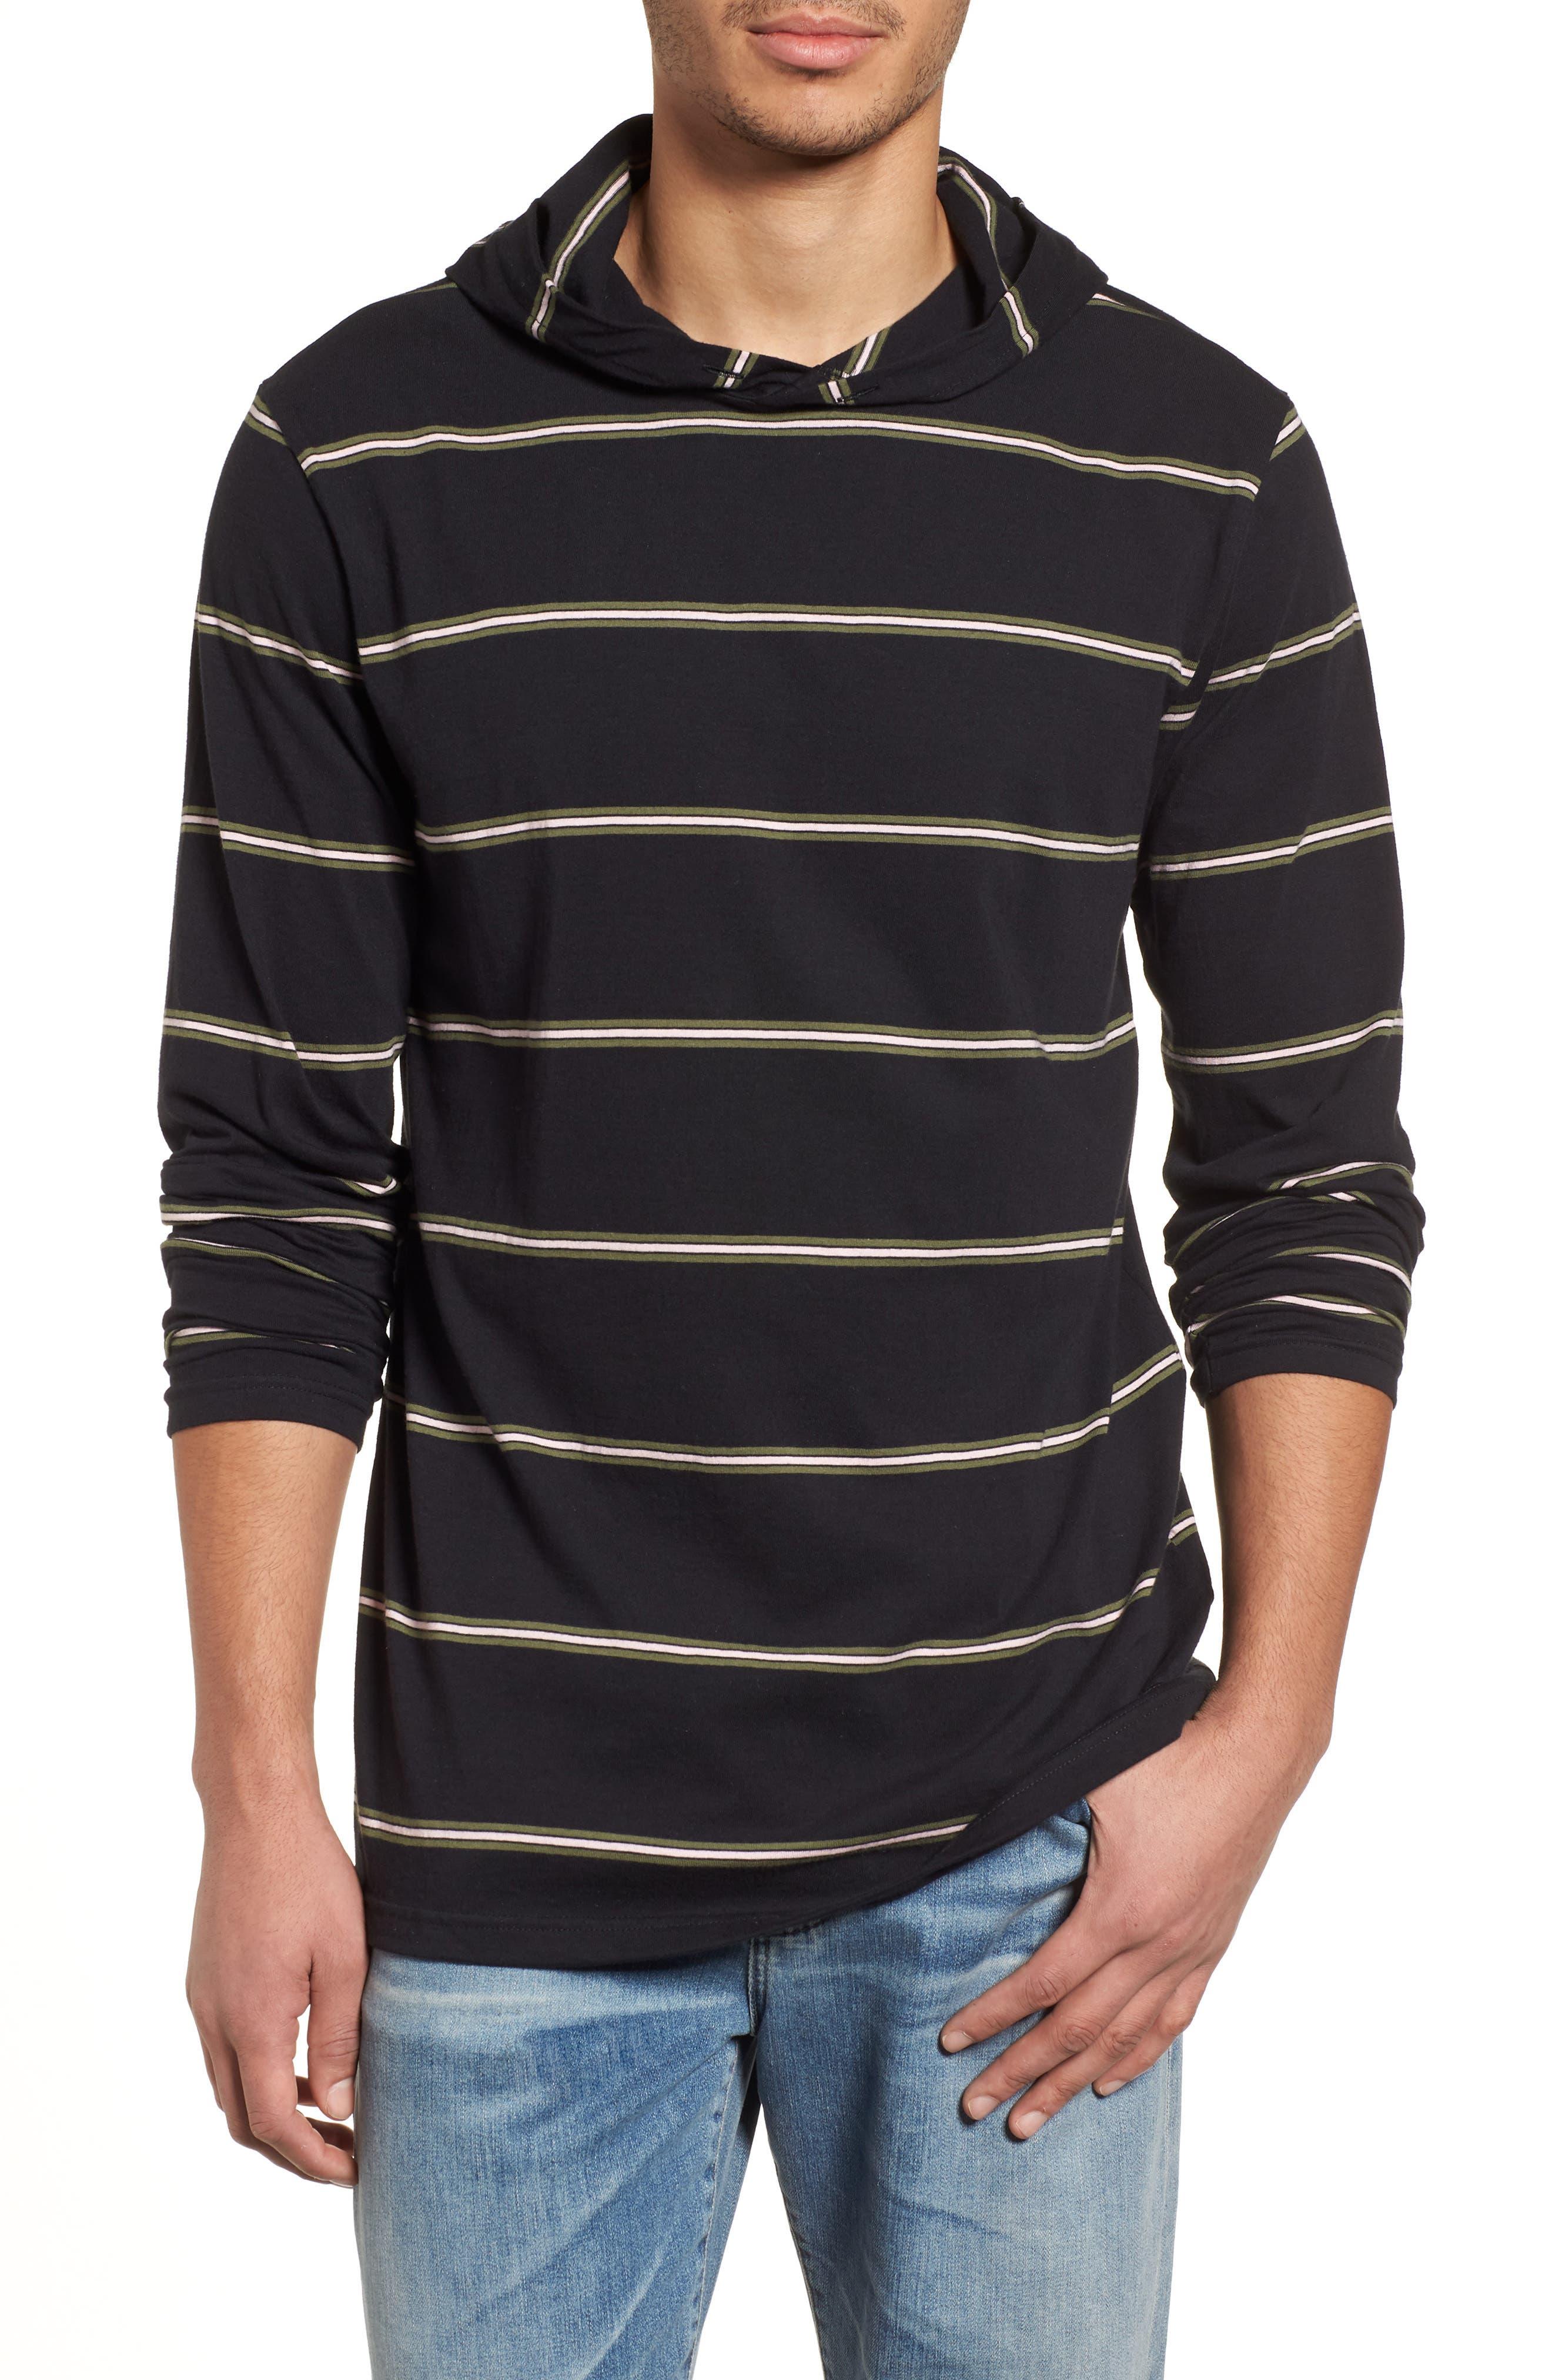 Main Image - Billabong Die Cut Hooded Long Sleeve T-Shirt